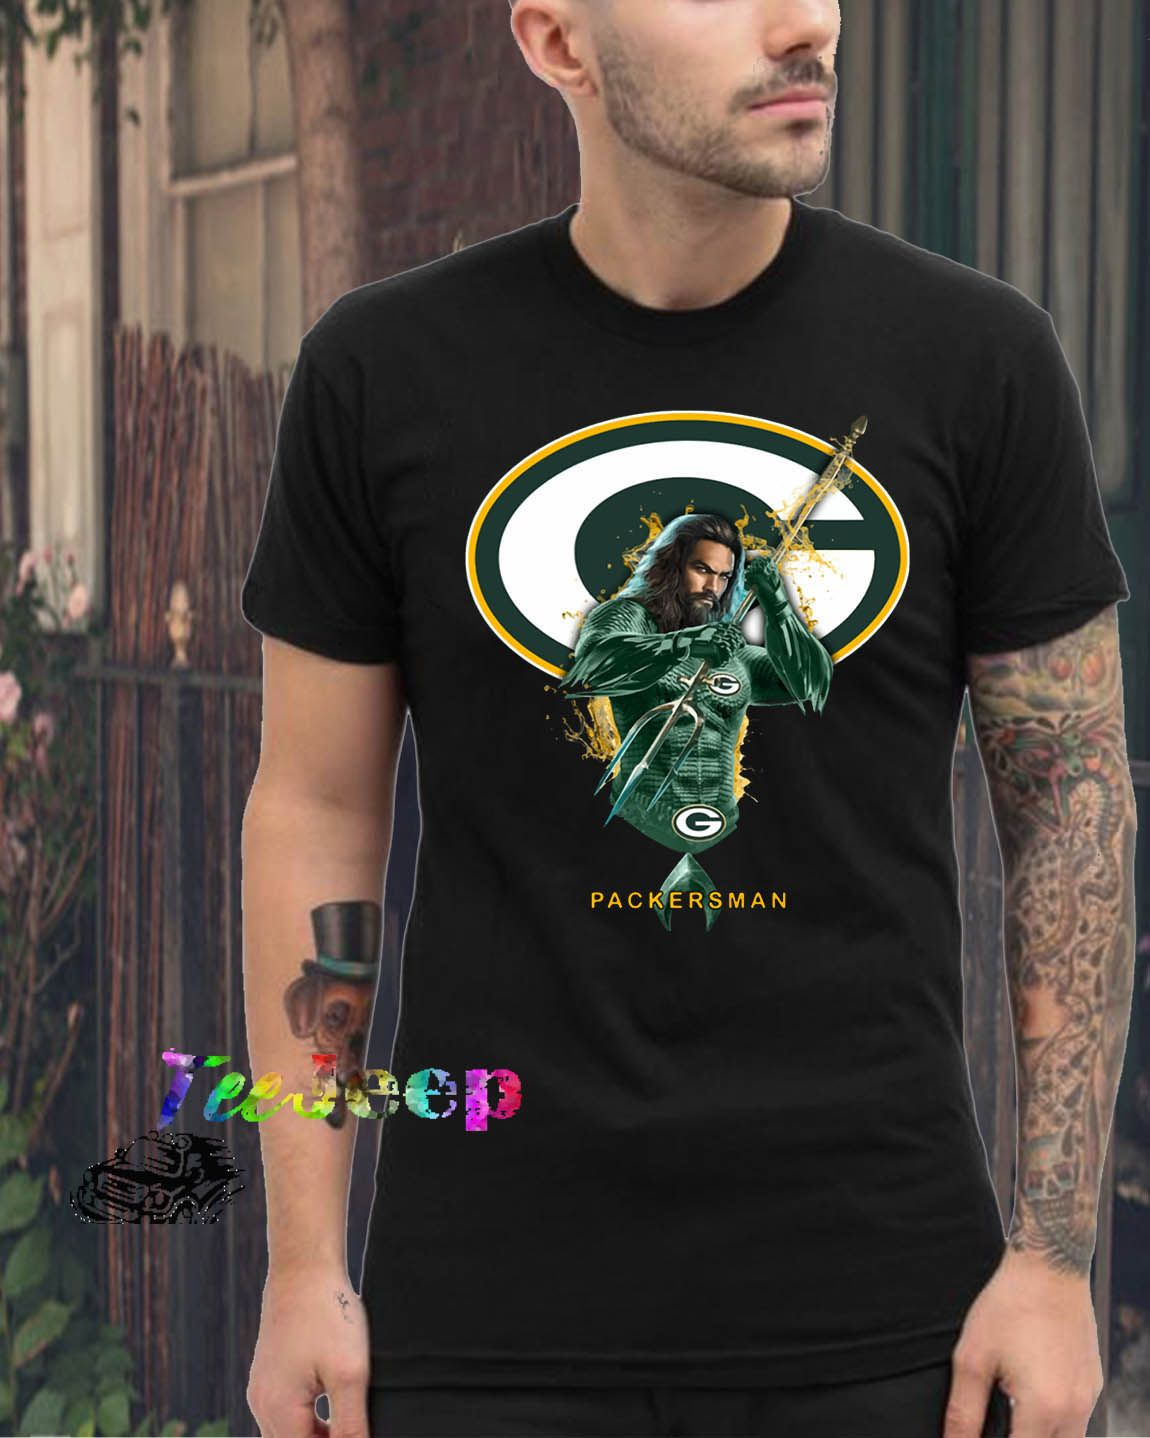 Packersman Aquaman And Packers Football Team TShirt